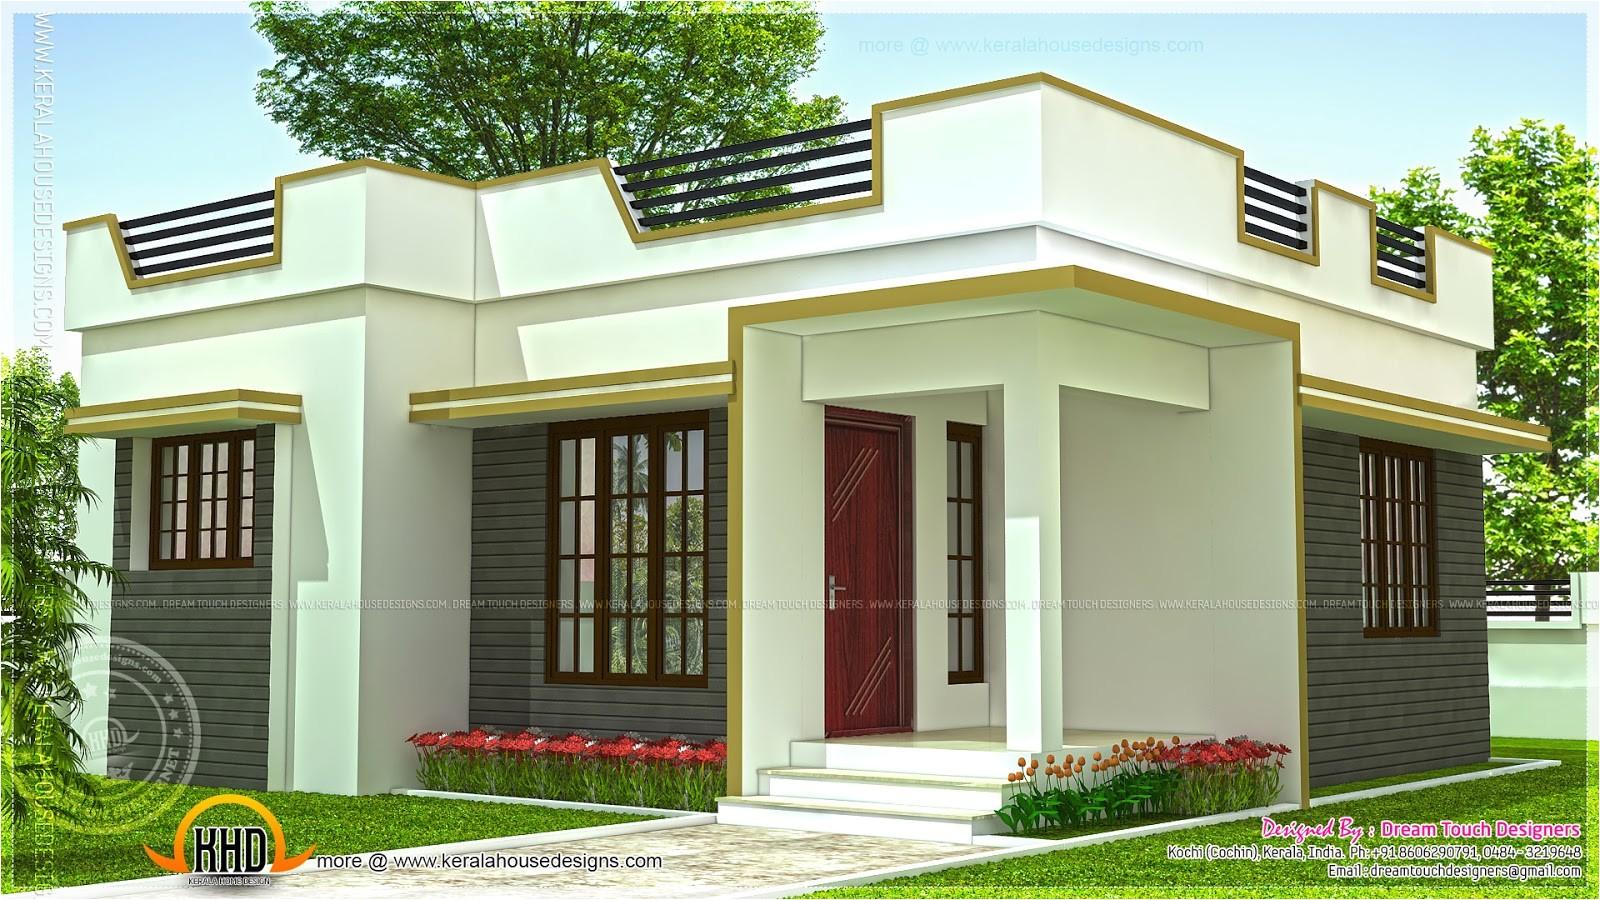 kerala small house low budget plan modern plans blog